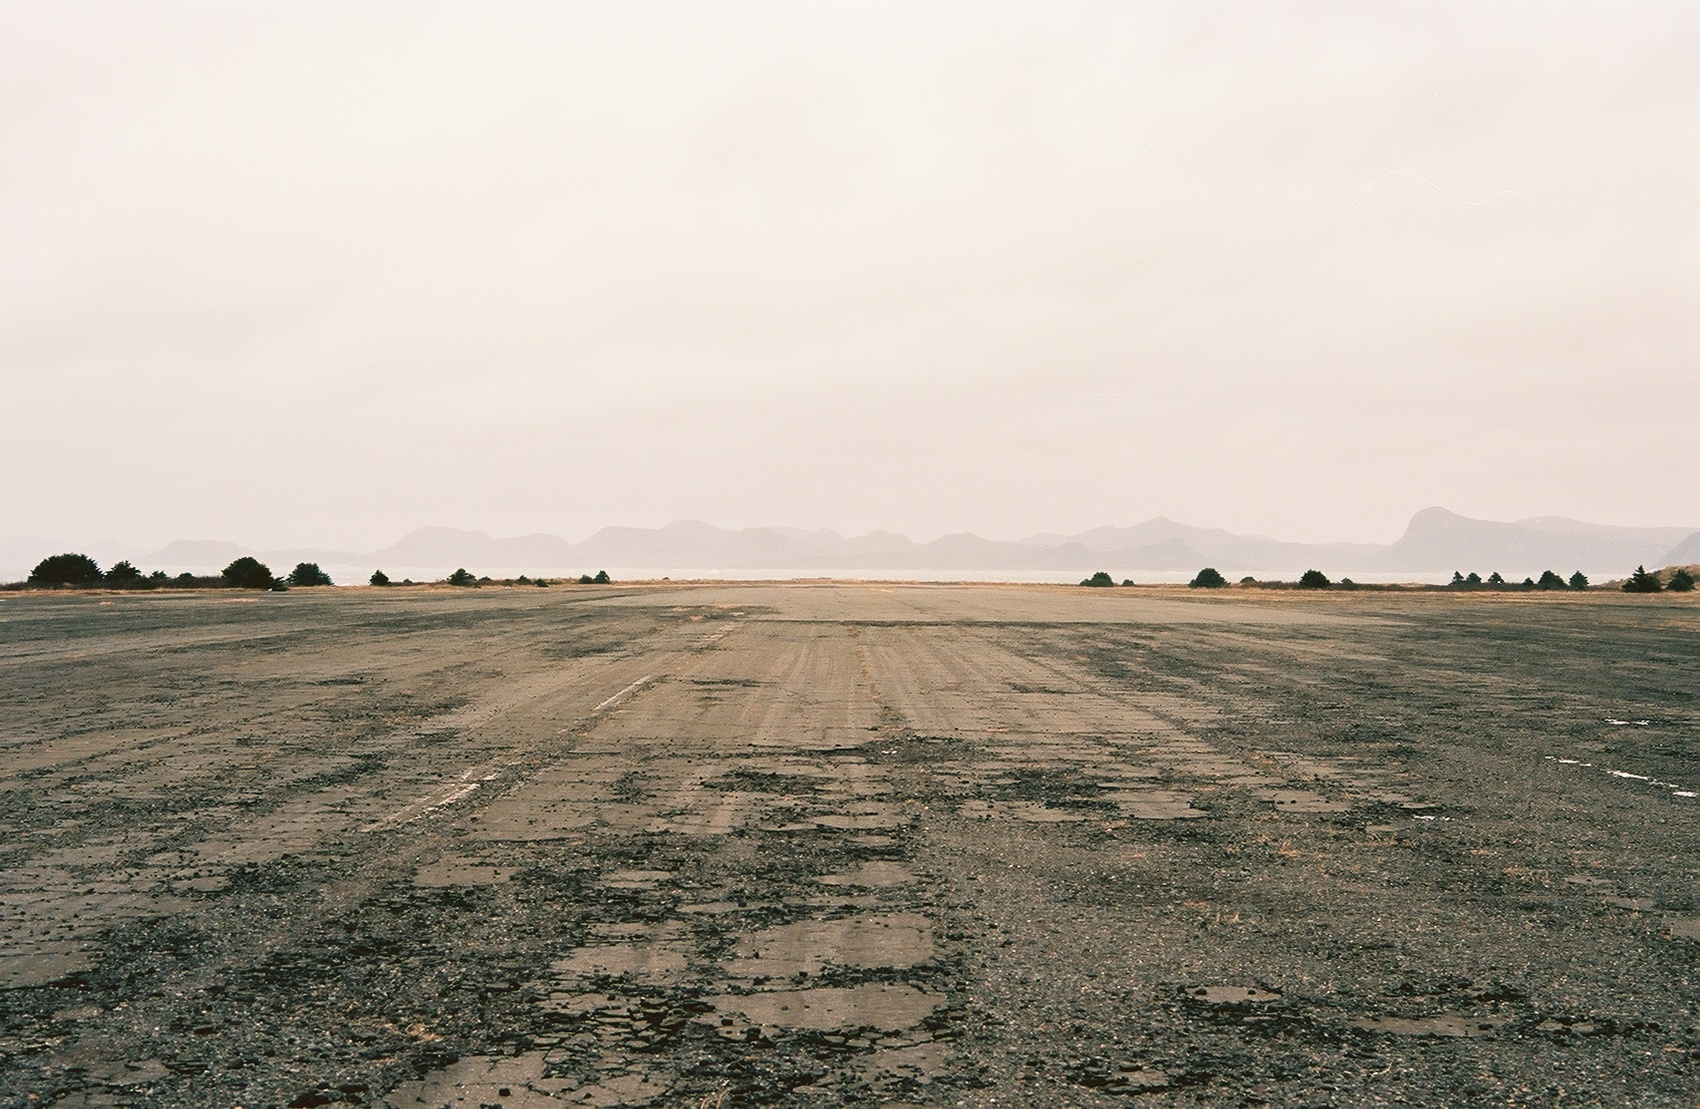 The massive runway complex slowly crumbles